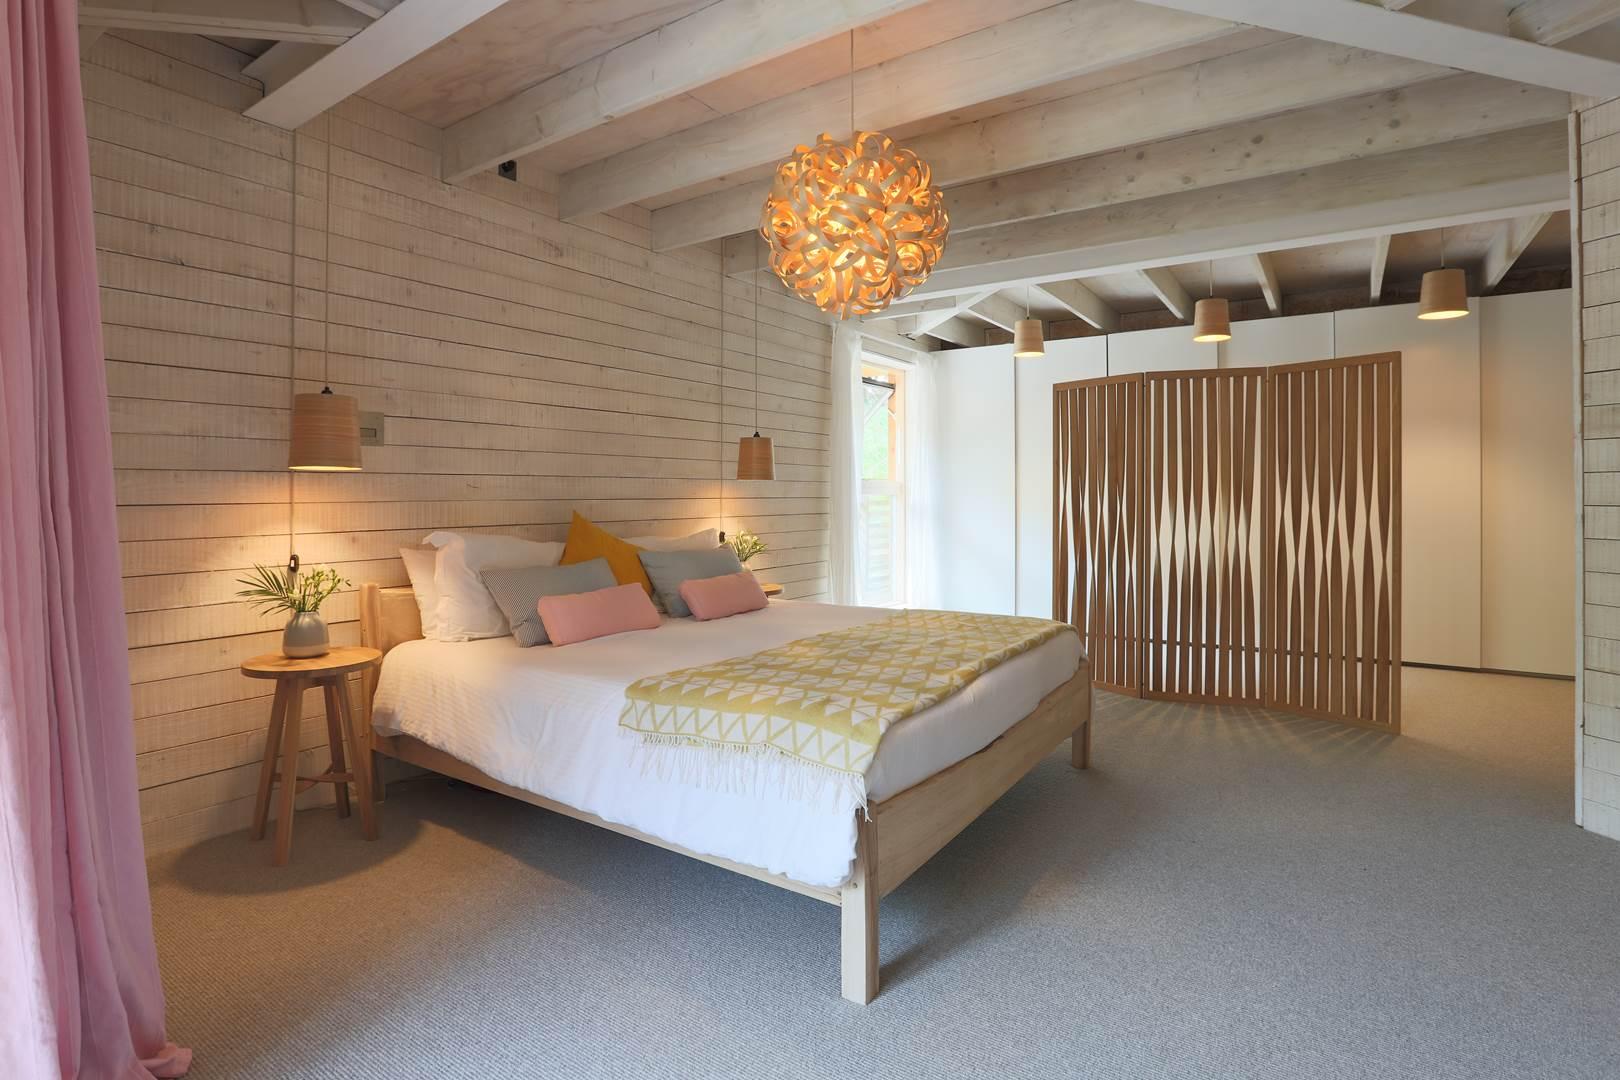 087-tom-raffield-grand-designs-house (Copy)